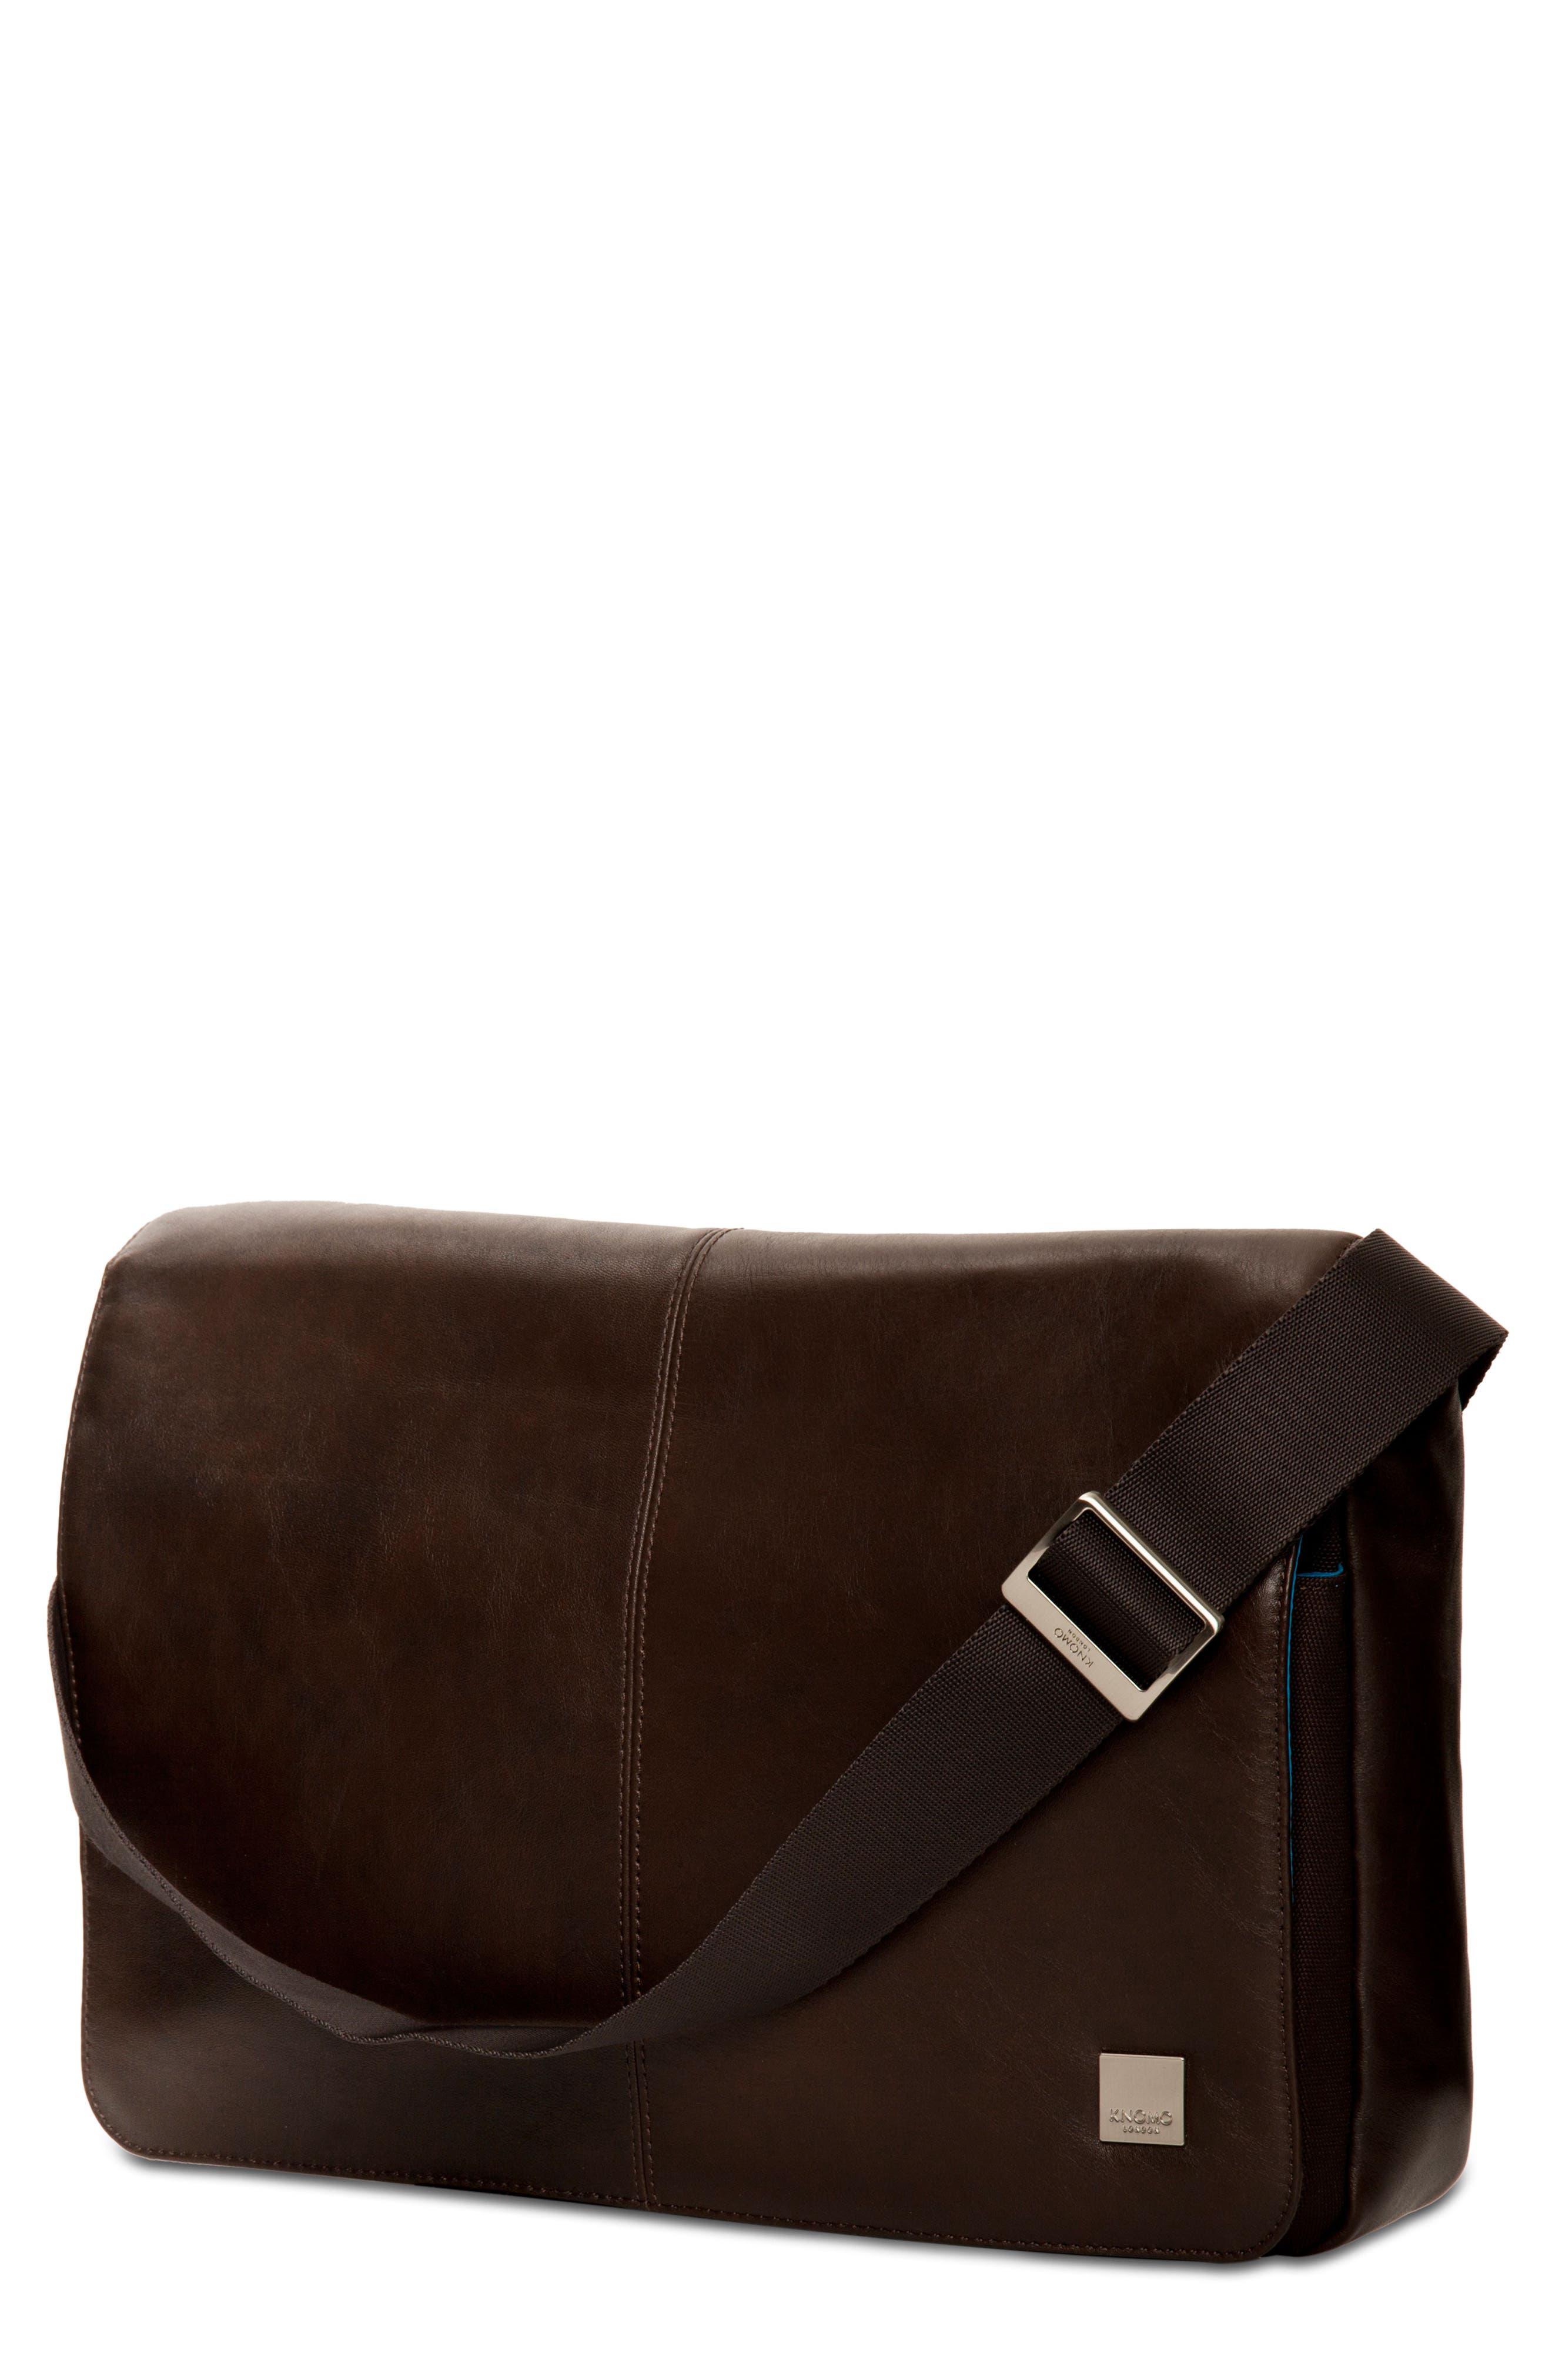 KNOMO London Brompton Kinsale RFID Leather Messenger Bag